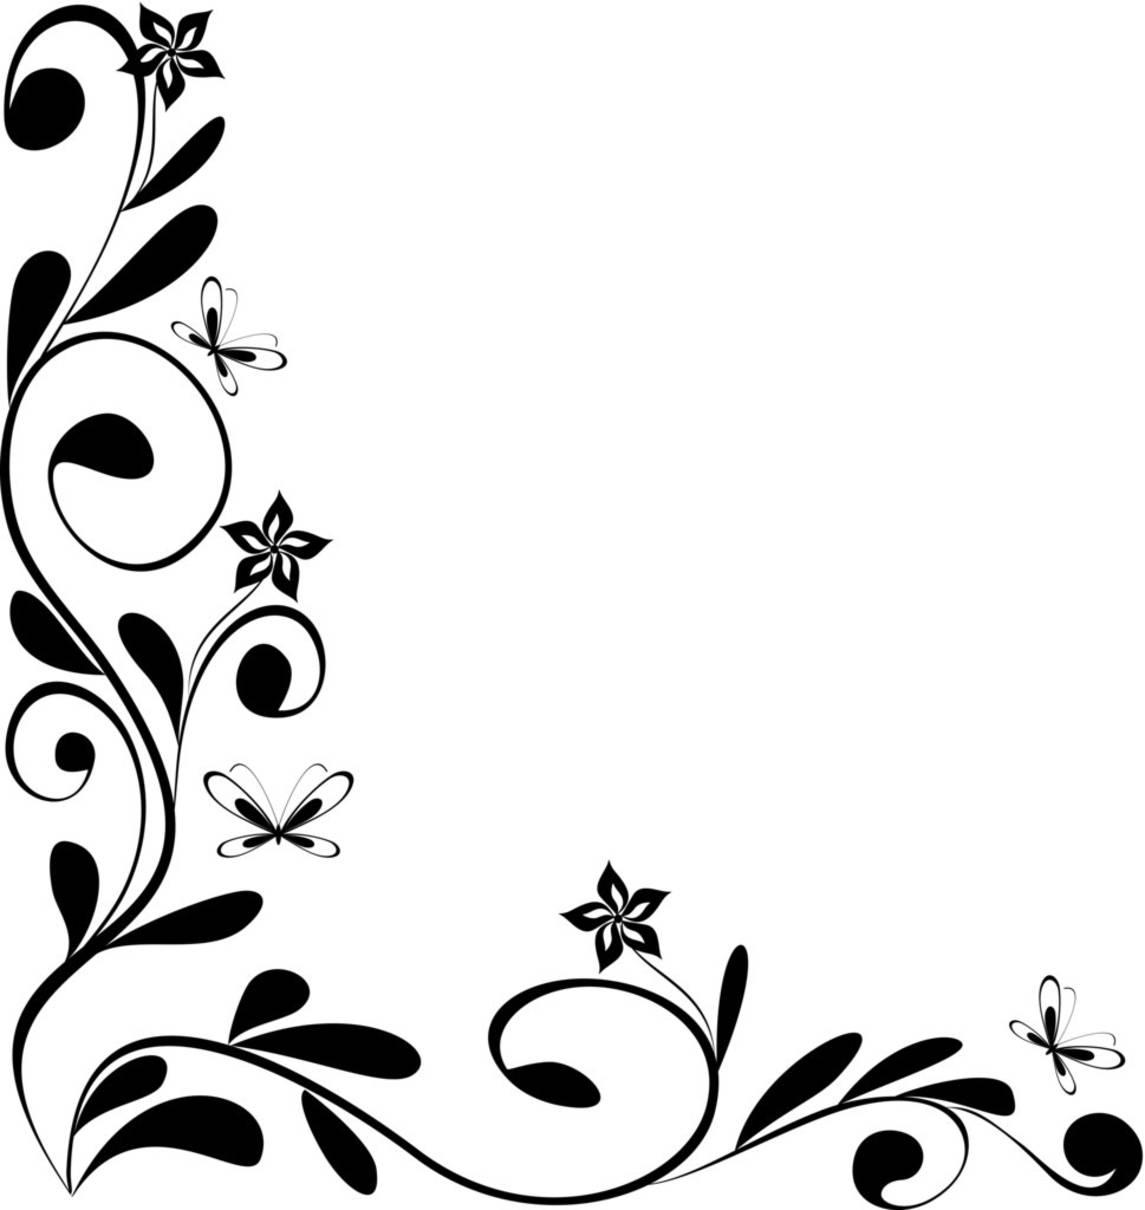 15 Black And White Flowers Corner Border Designs Images